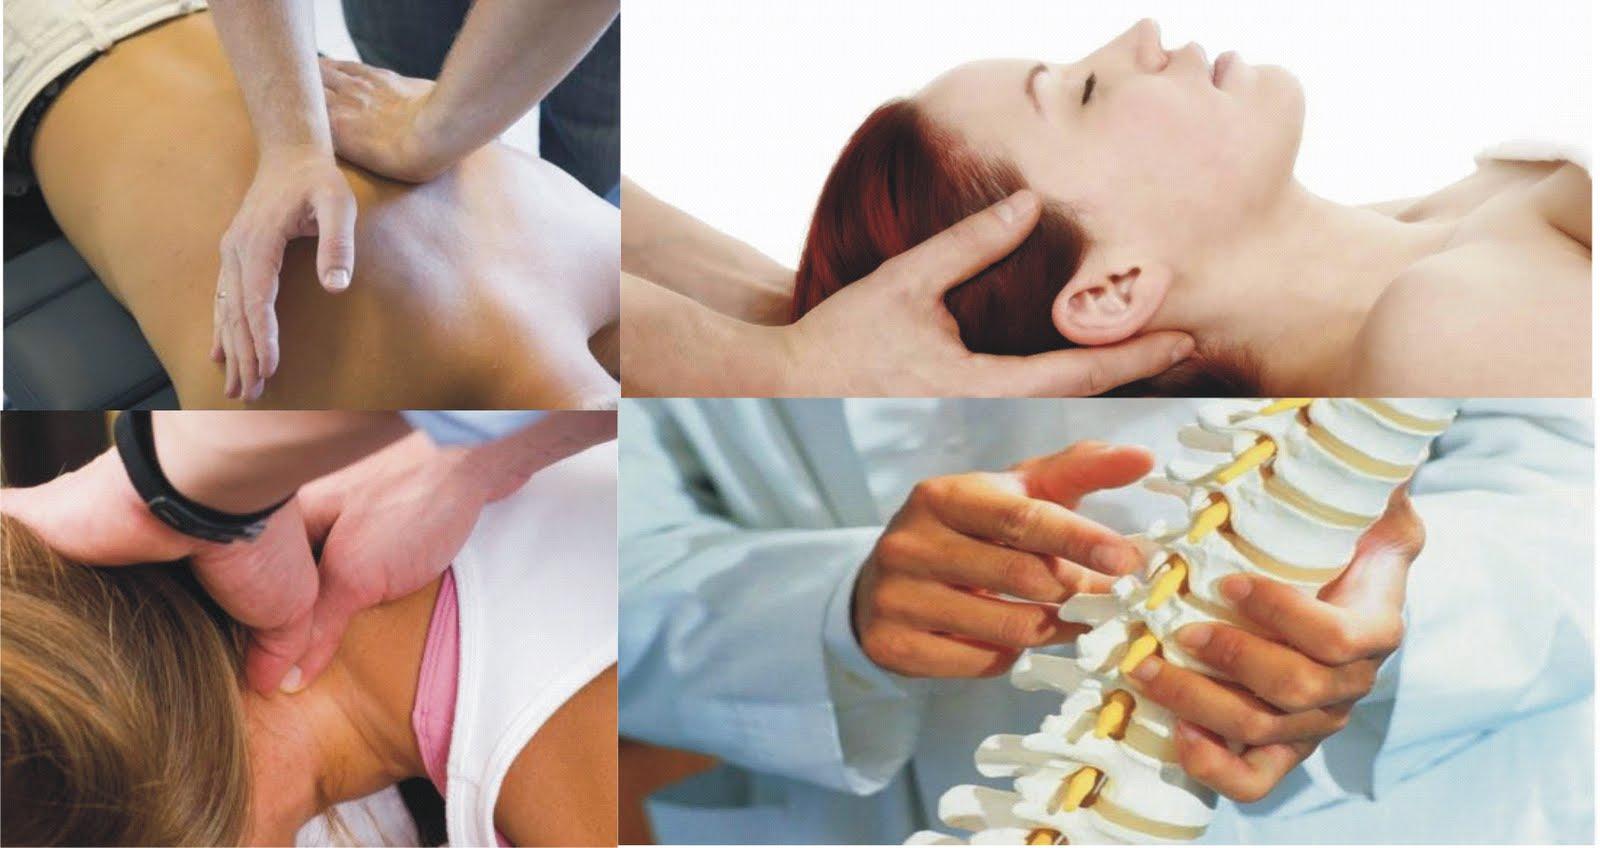 Quiropraxia un método no invasivo con grandes beneficios